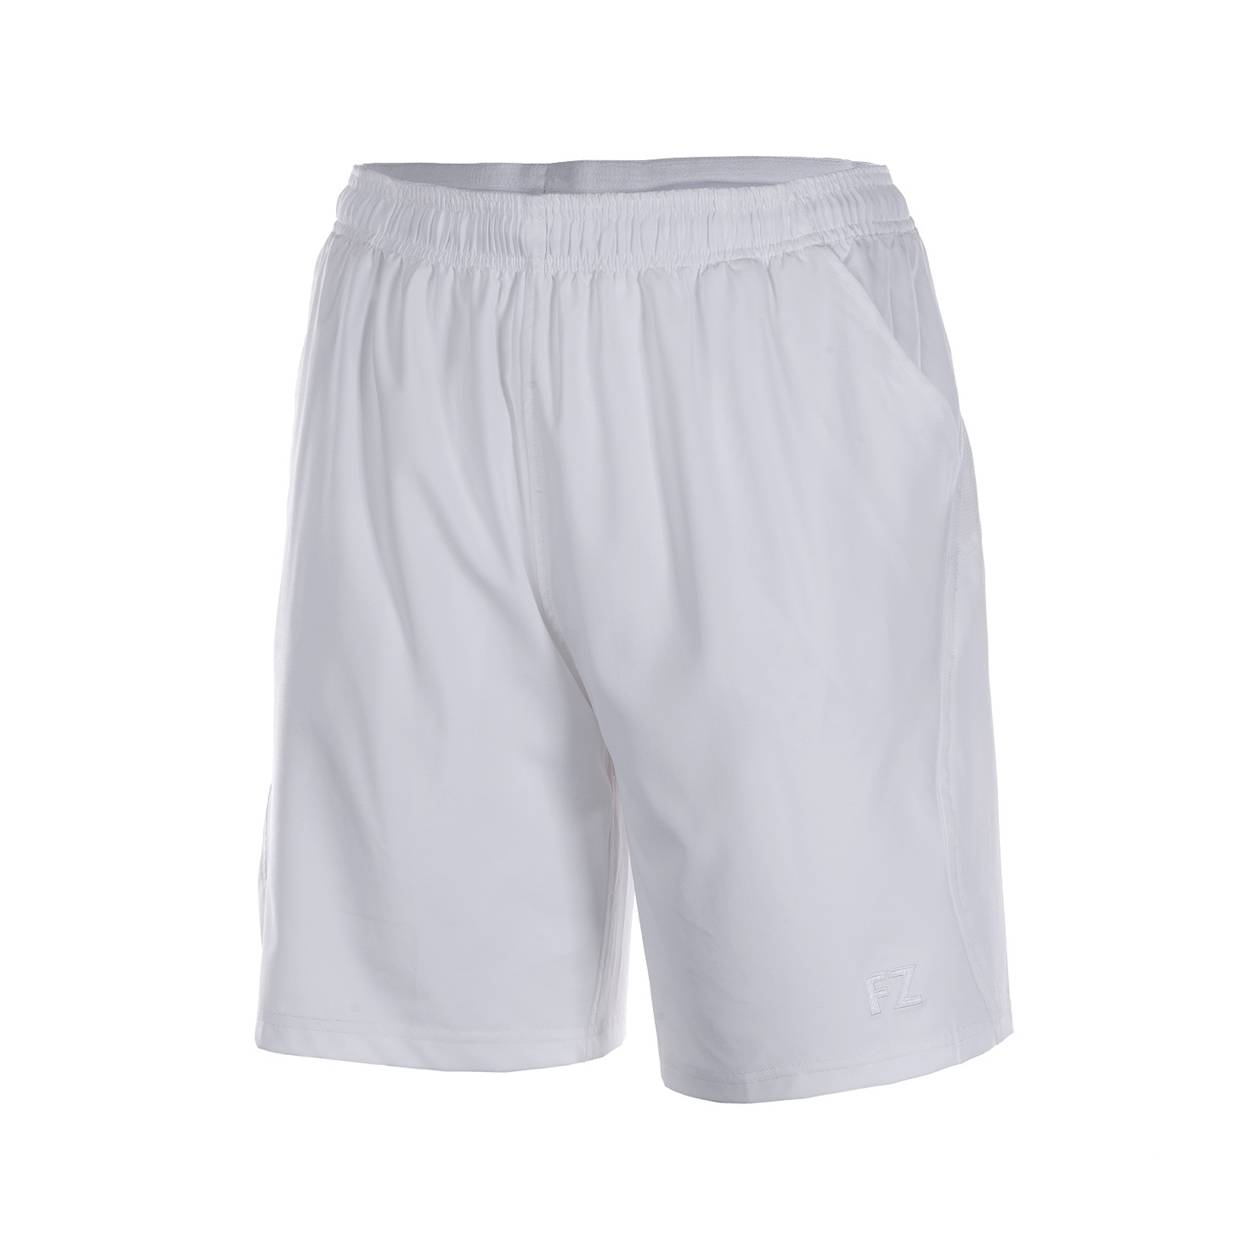 FZ Forza Ajax Shorts Men White M